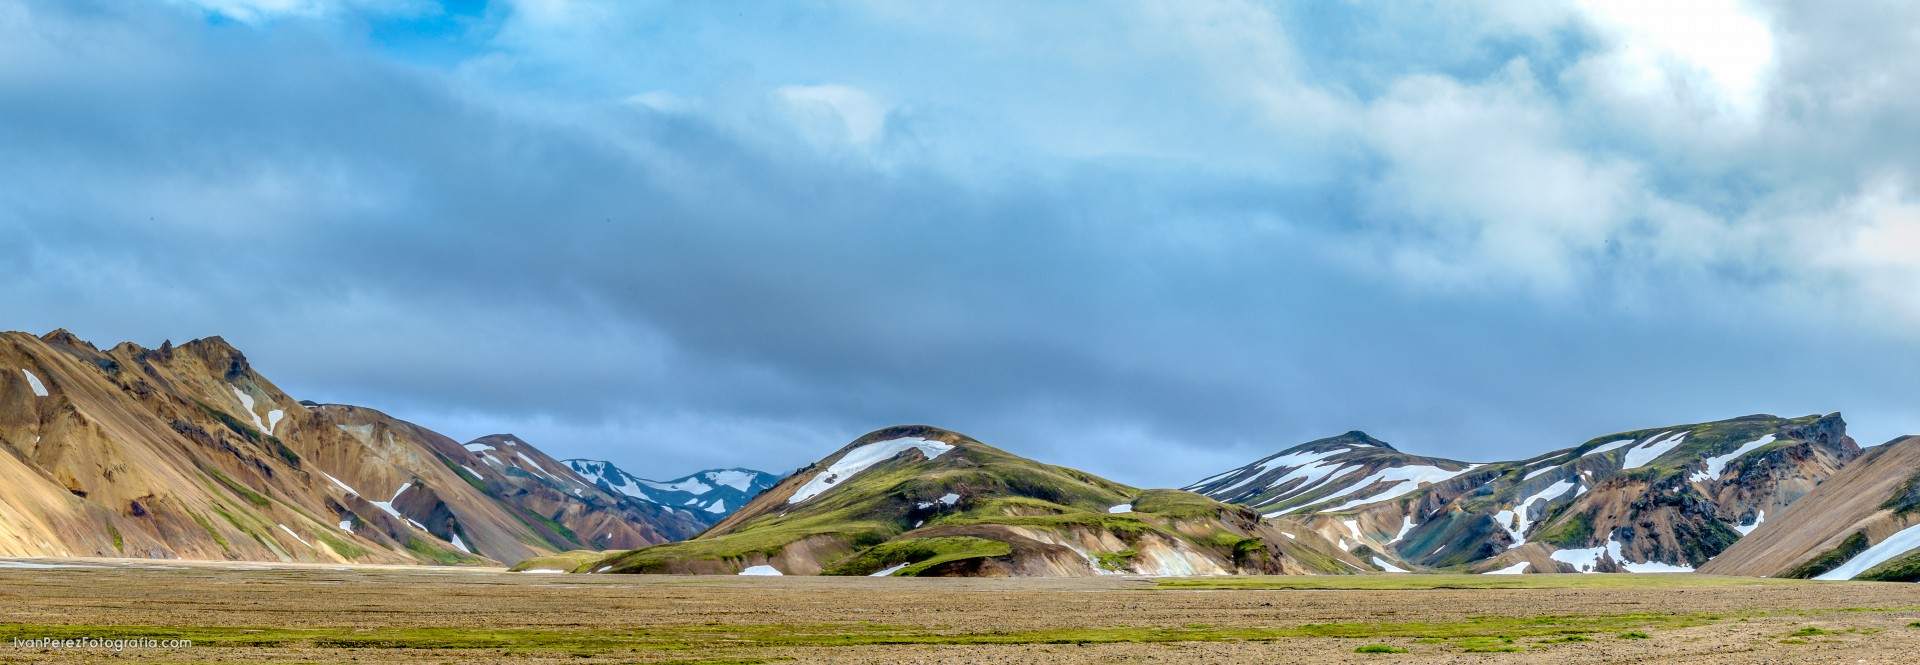 Landmannalaugar, Islandia, 2015